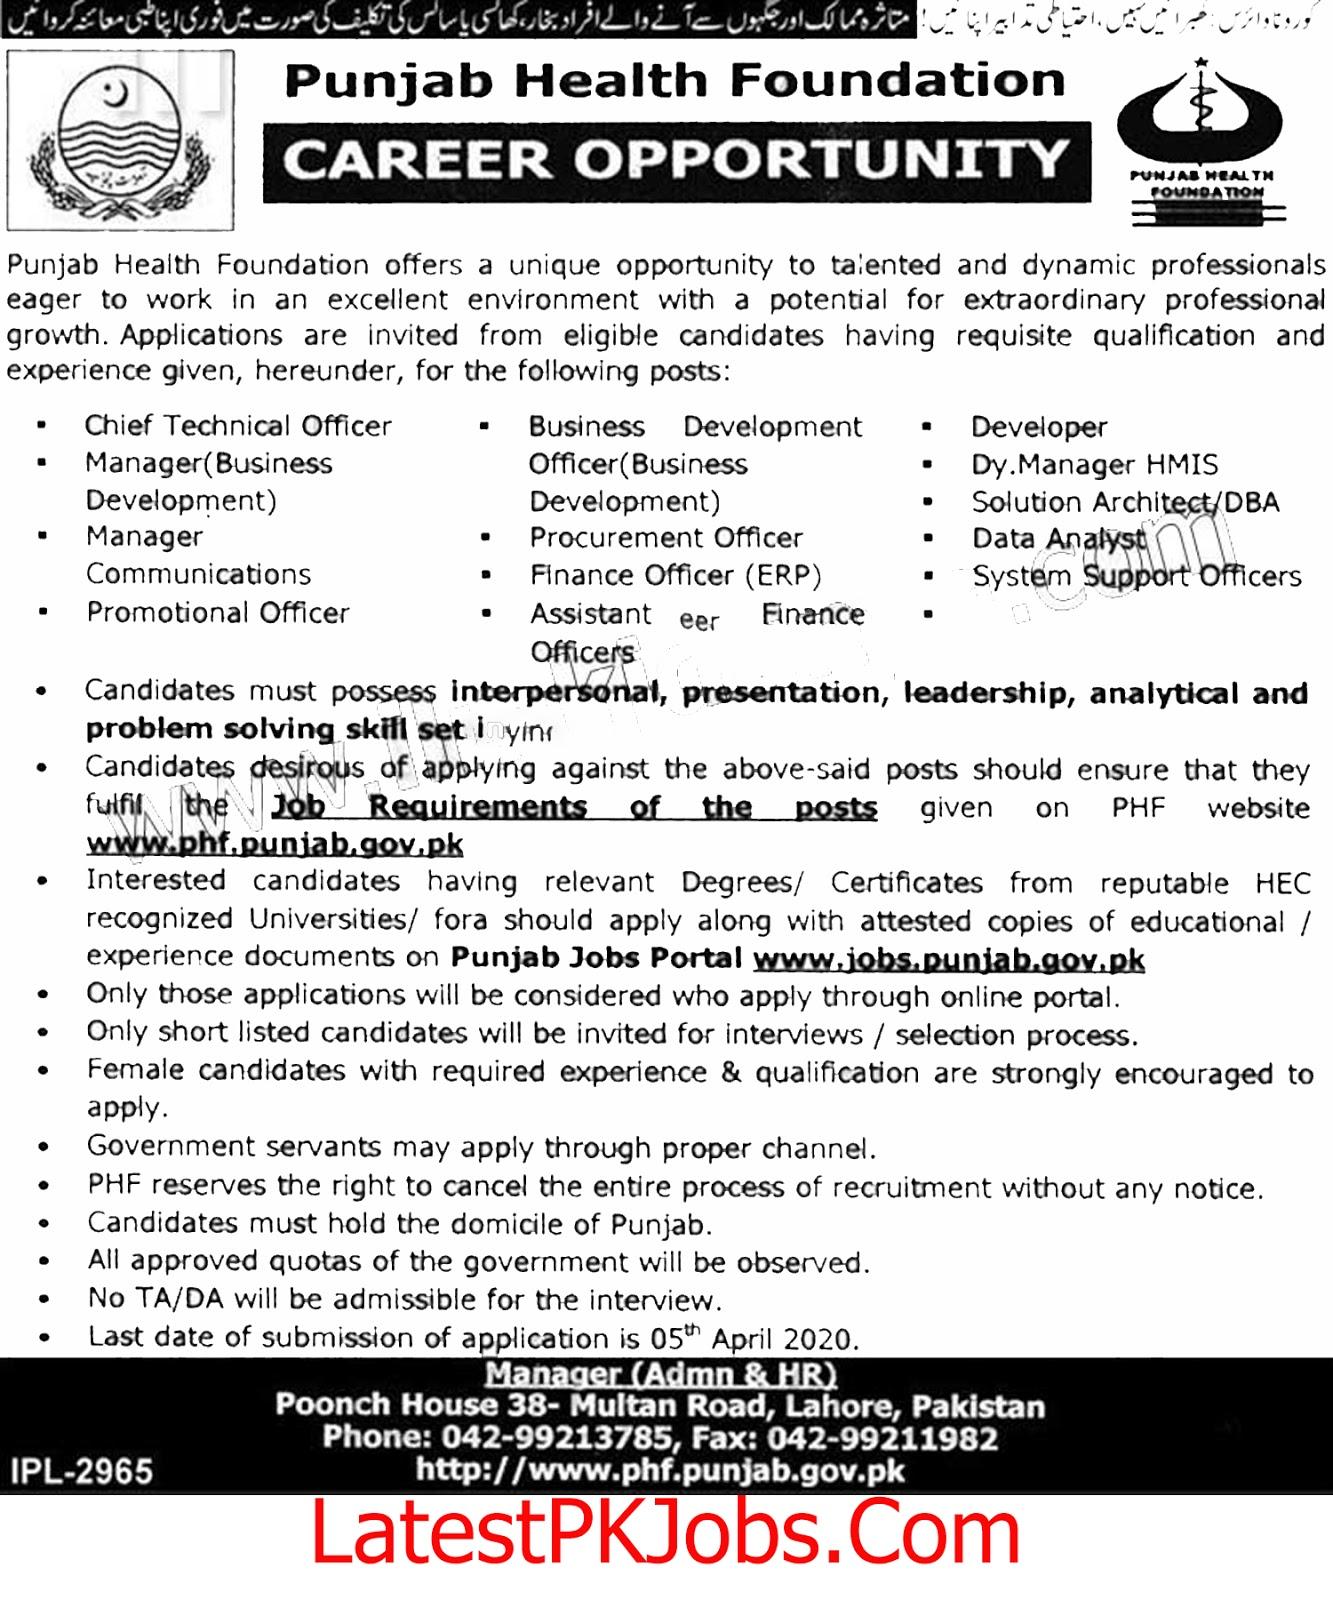 Health Department Punjab Jobs 2020 - LatestPKJobs